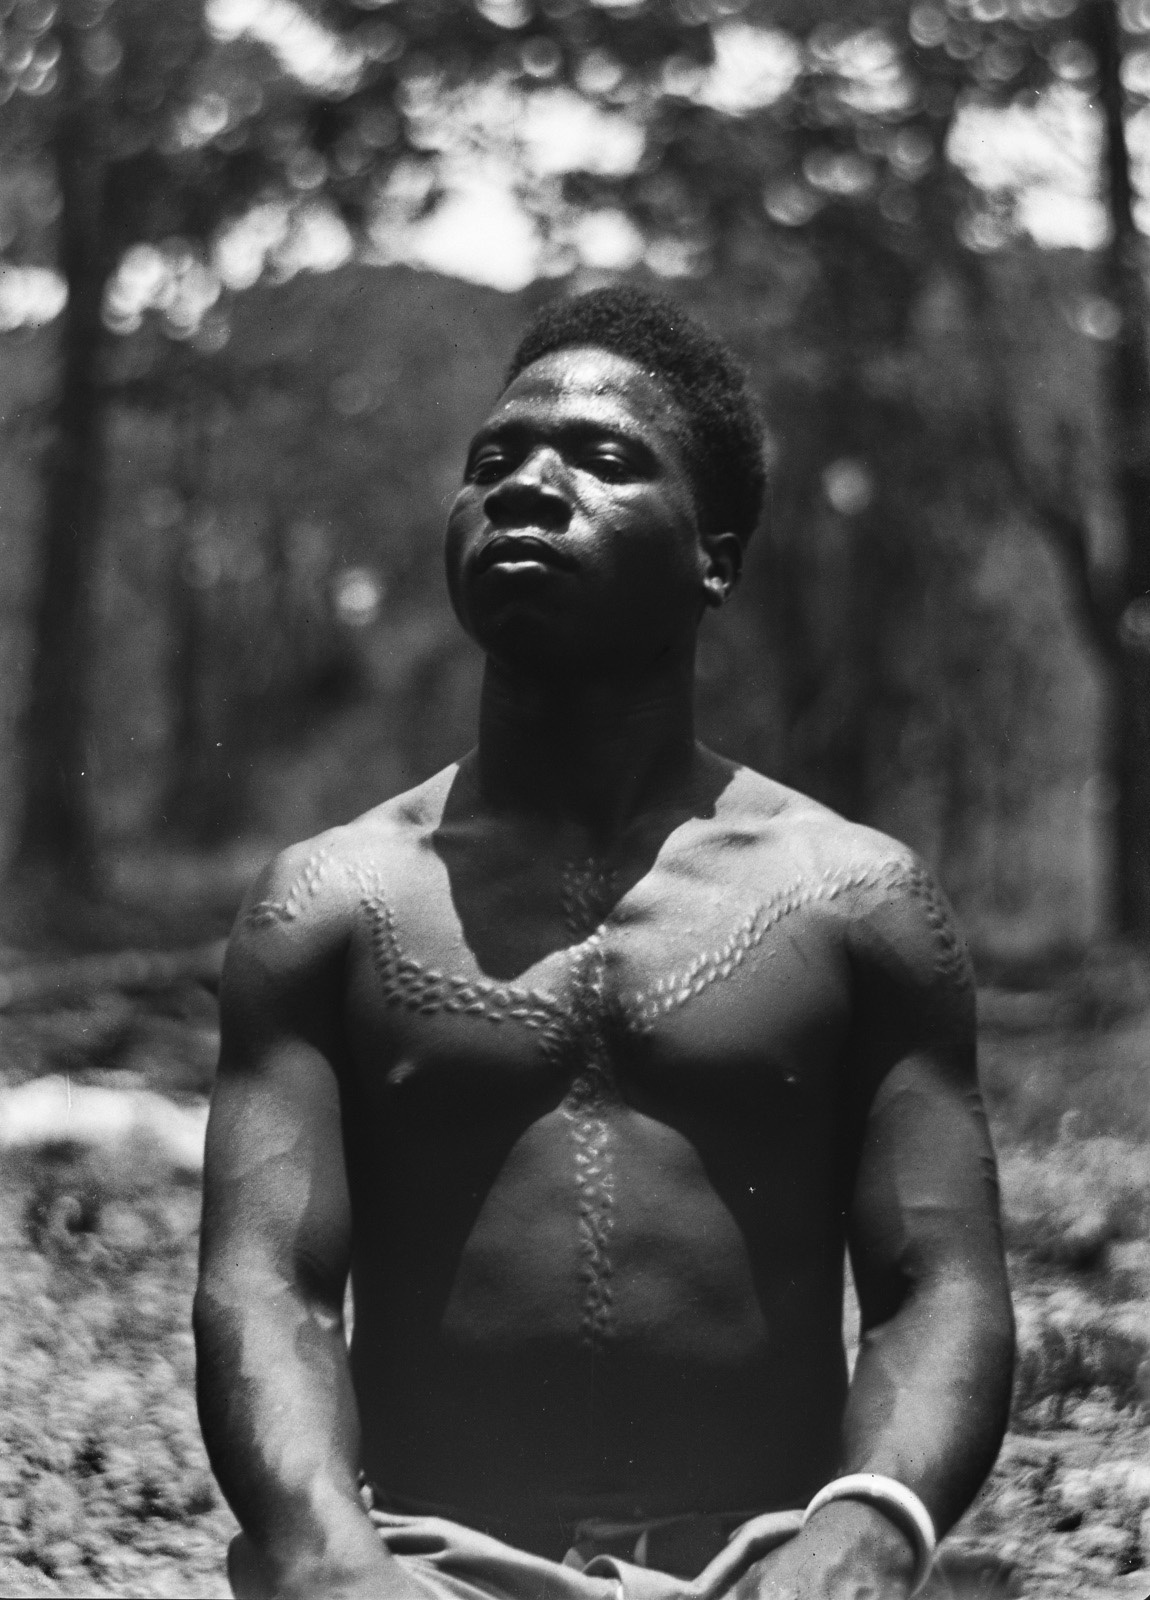 Касемпа. Мужчина народности каонда